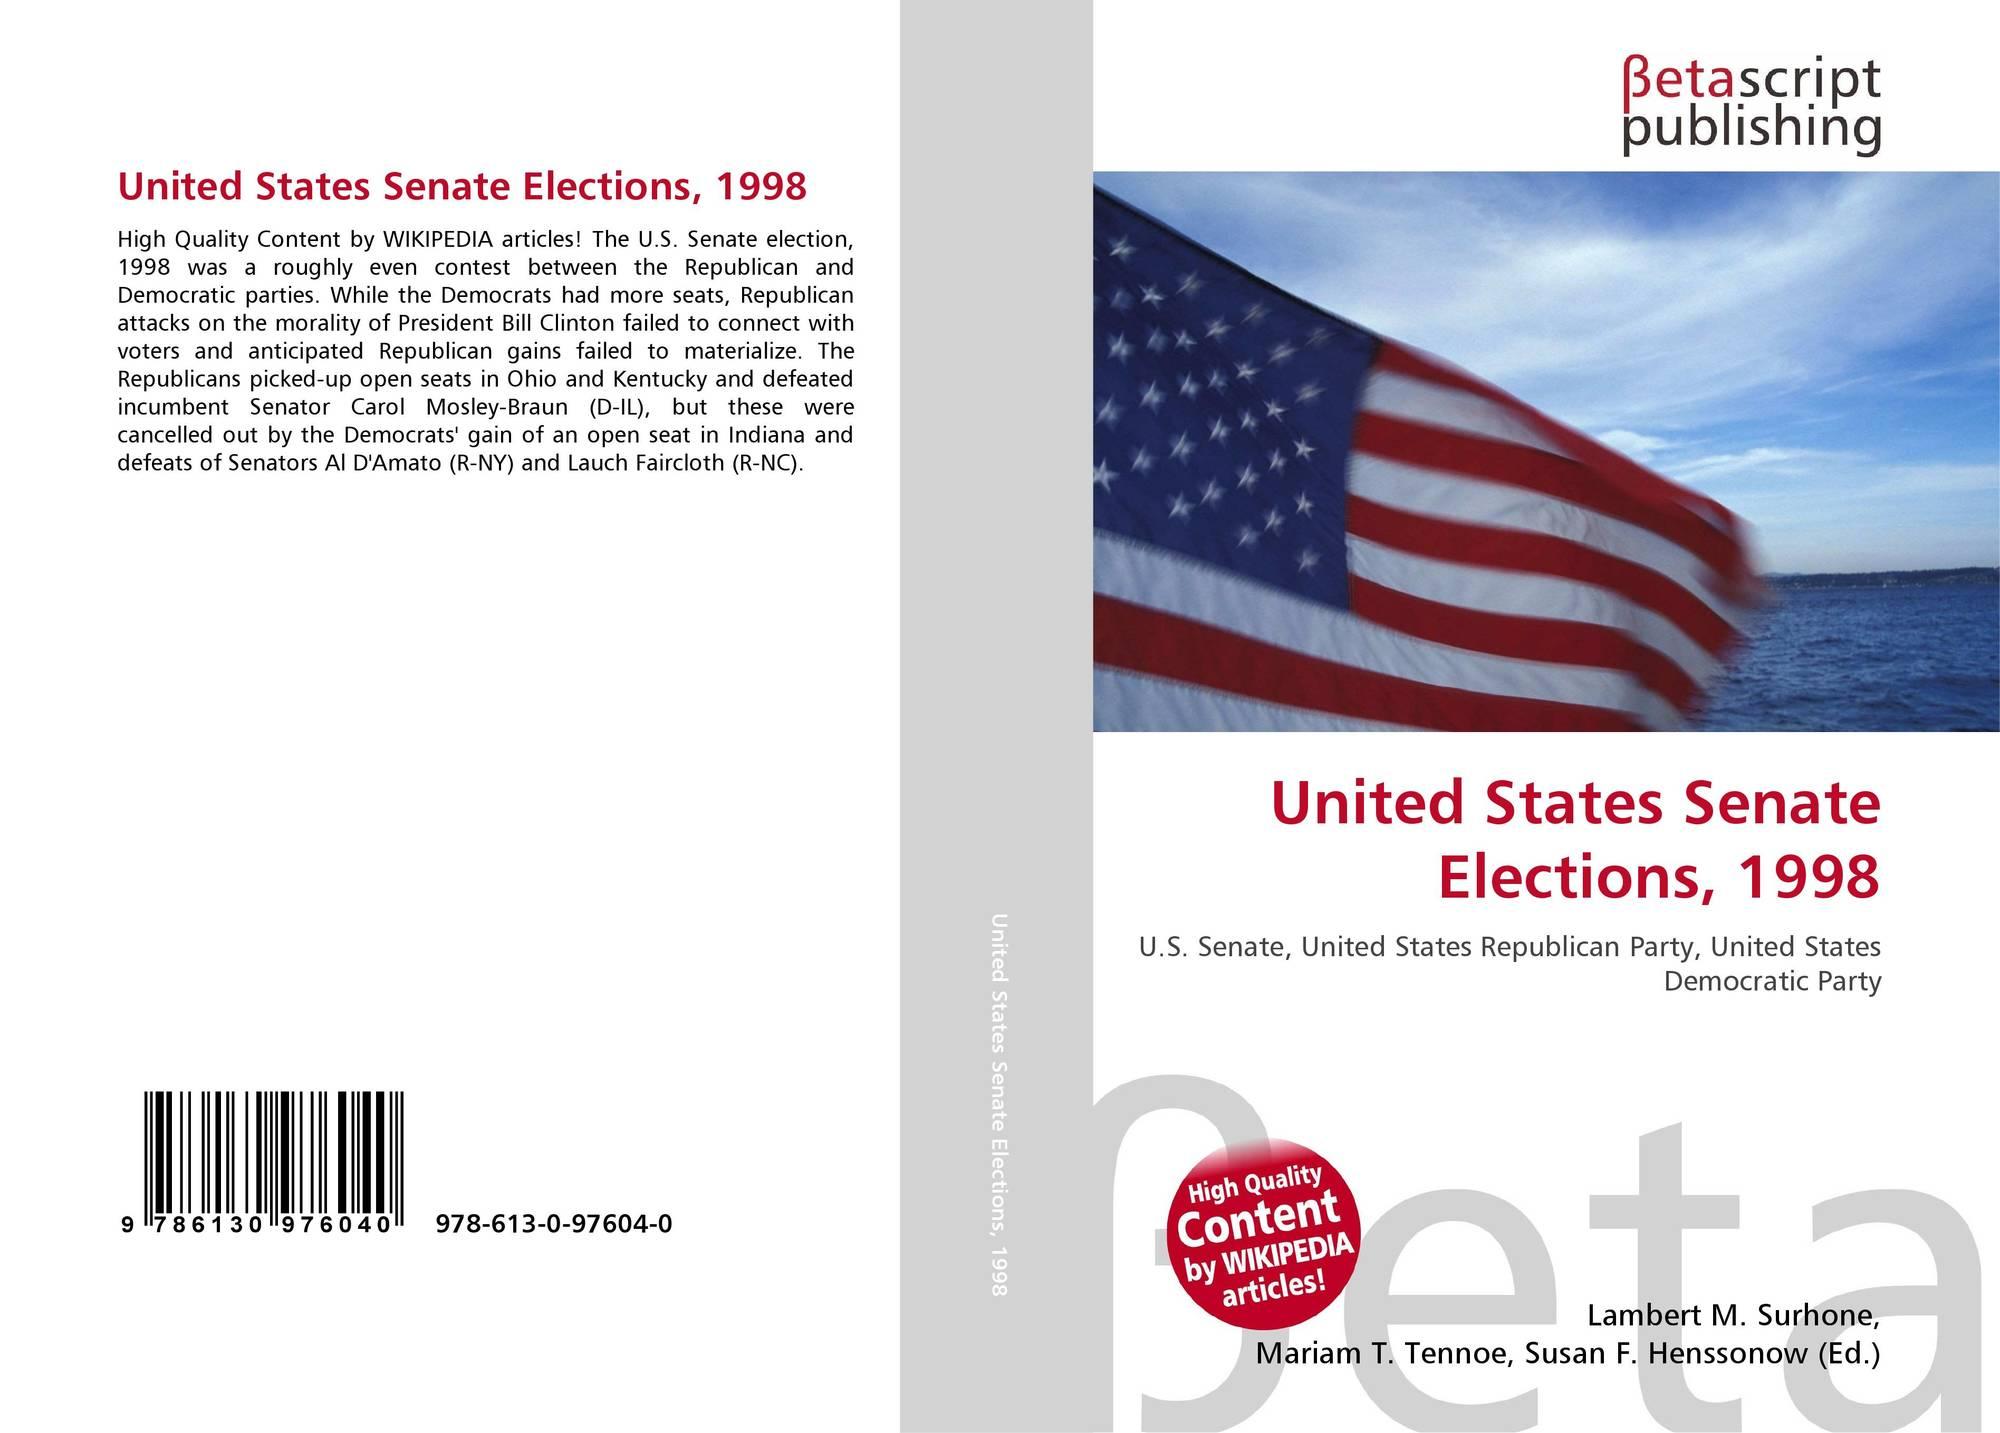 1986 United States Senate elections